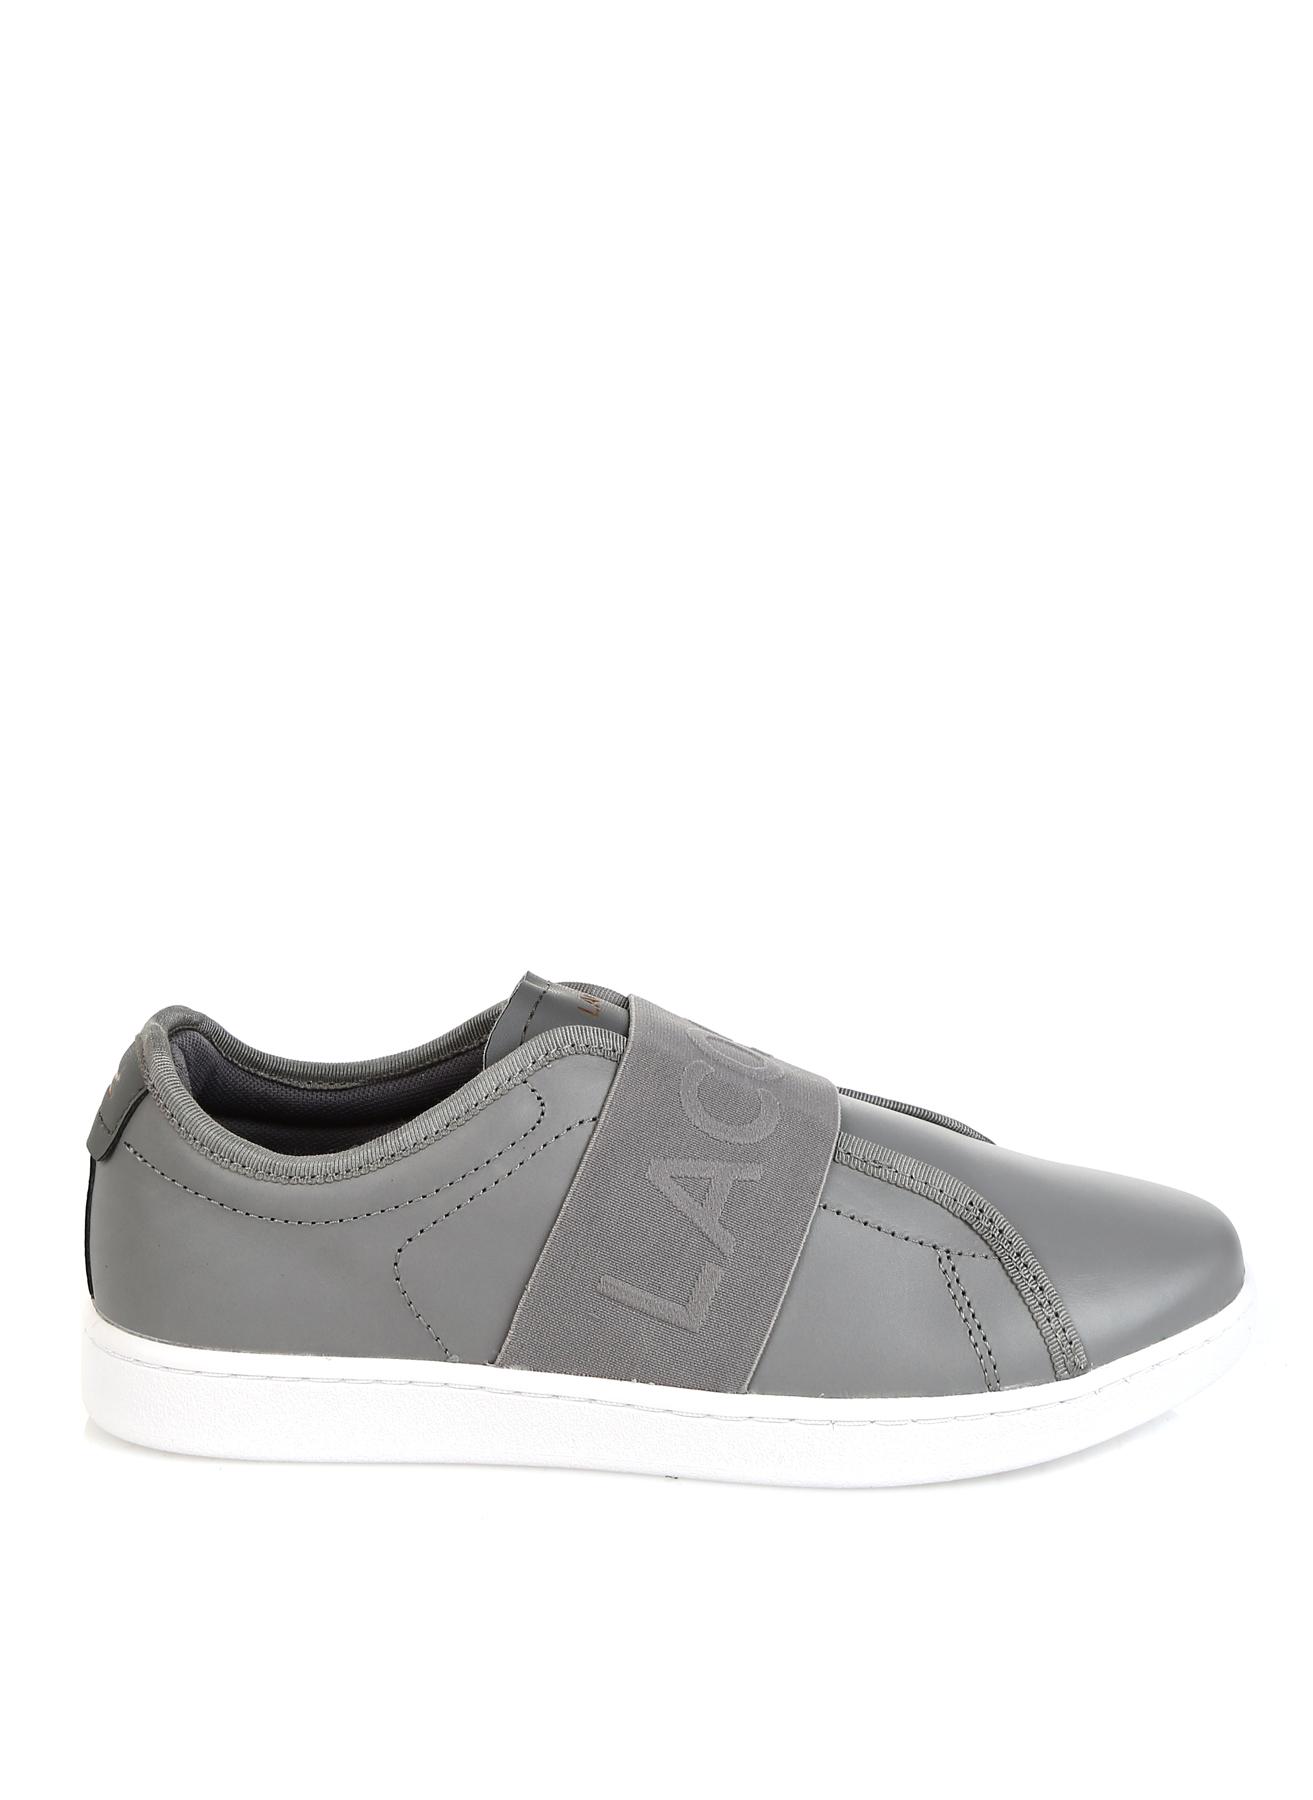 Lacoste Sneaker 38 5002312562003 Ürün Resmi